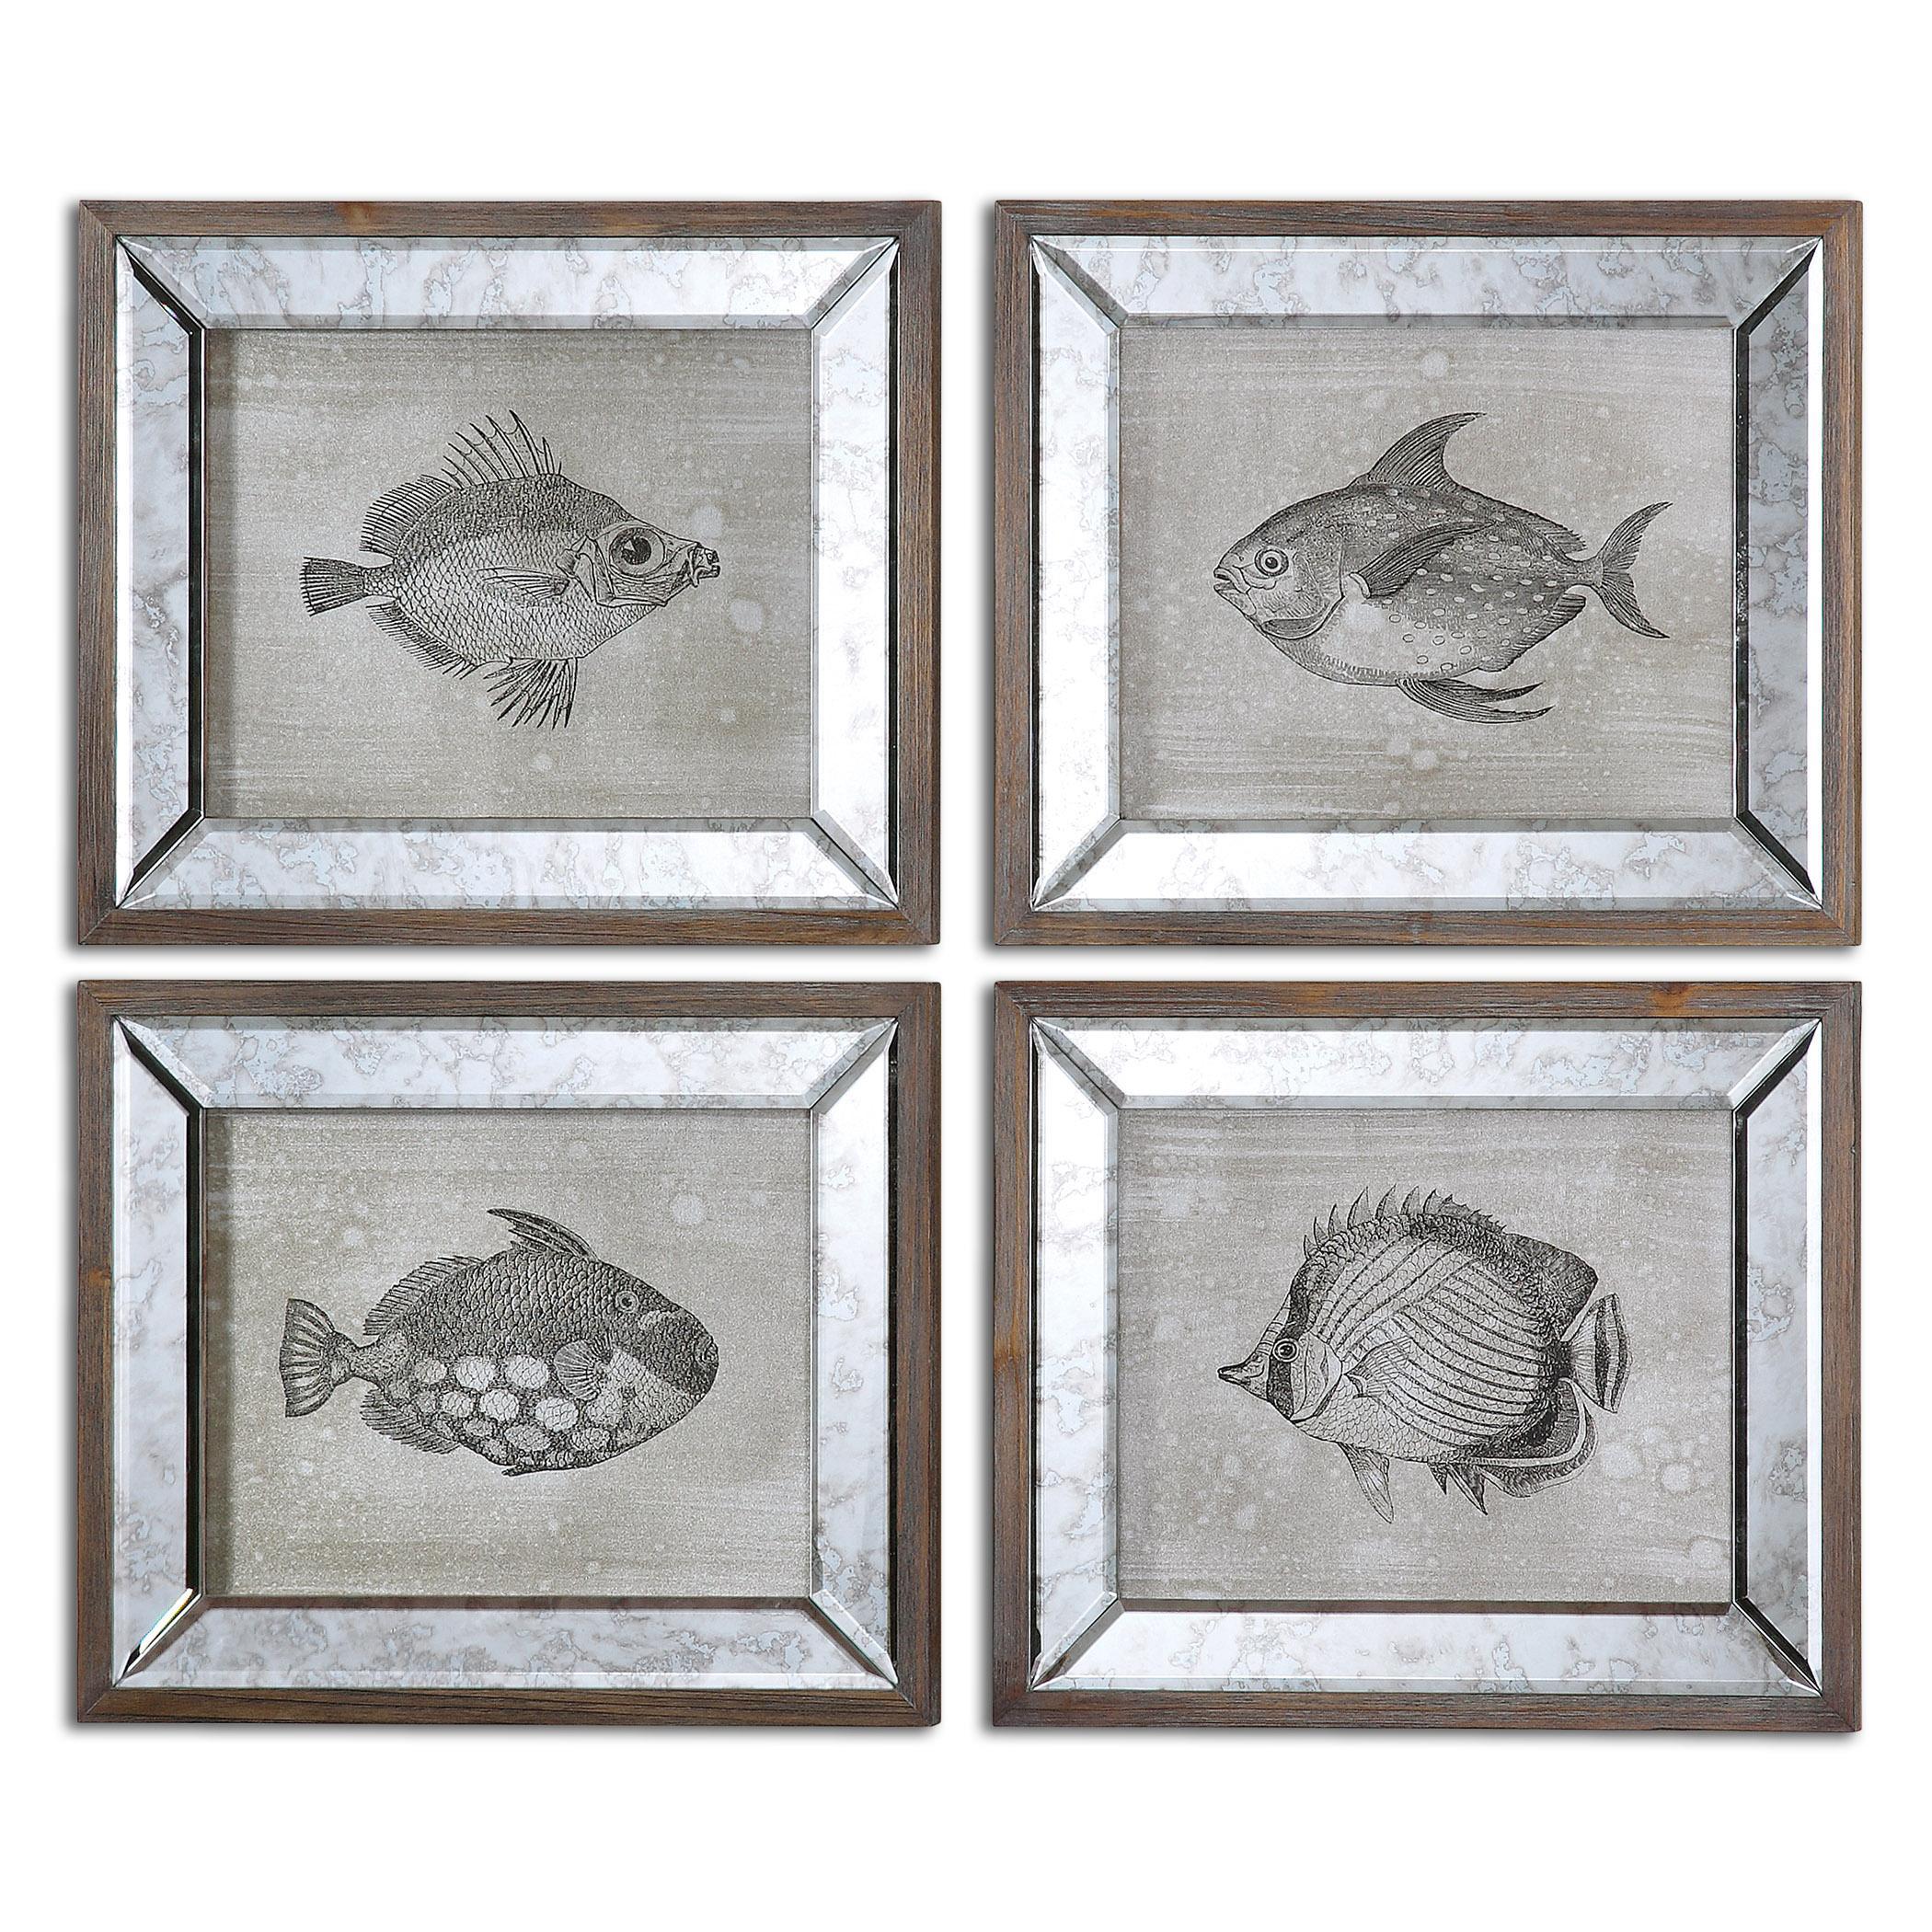 Mirrored Fish Framed Art Set of 4